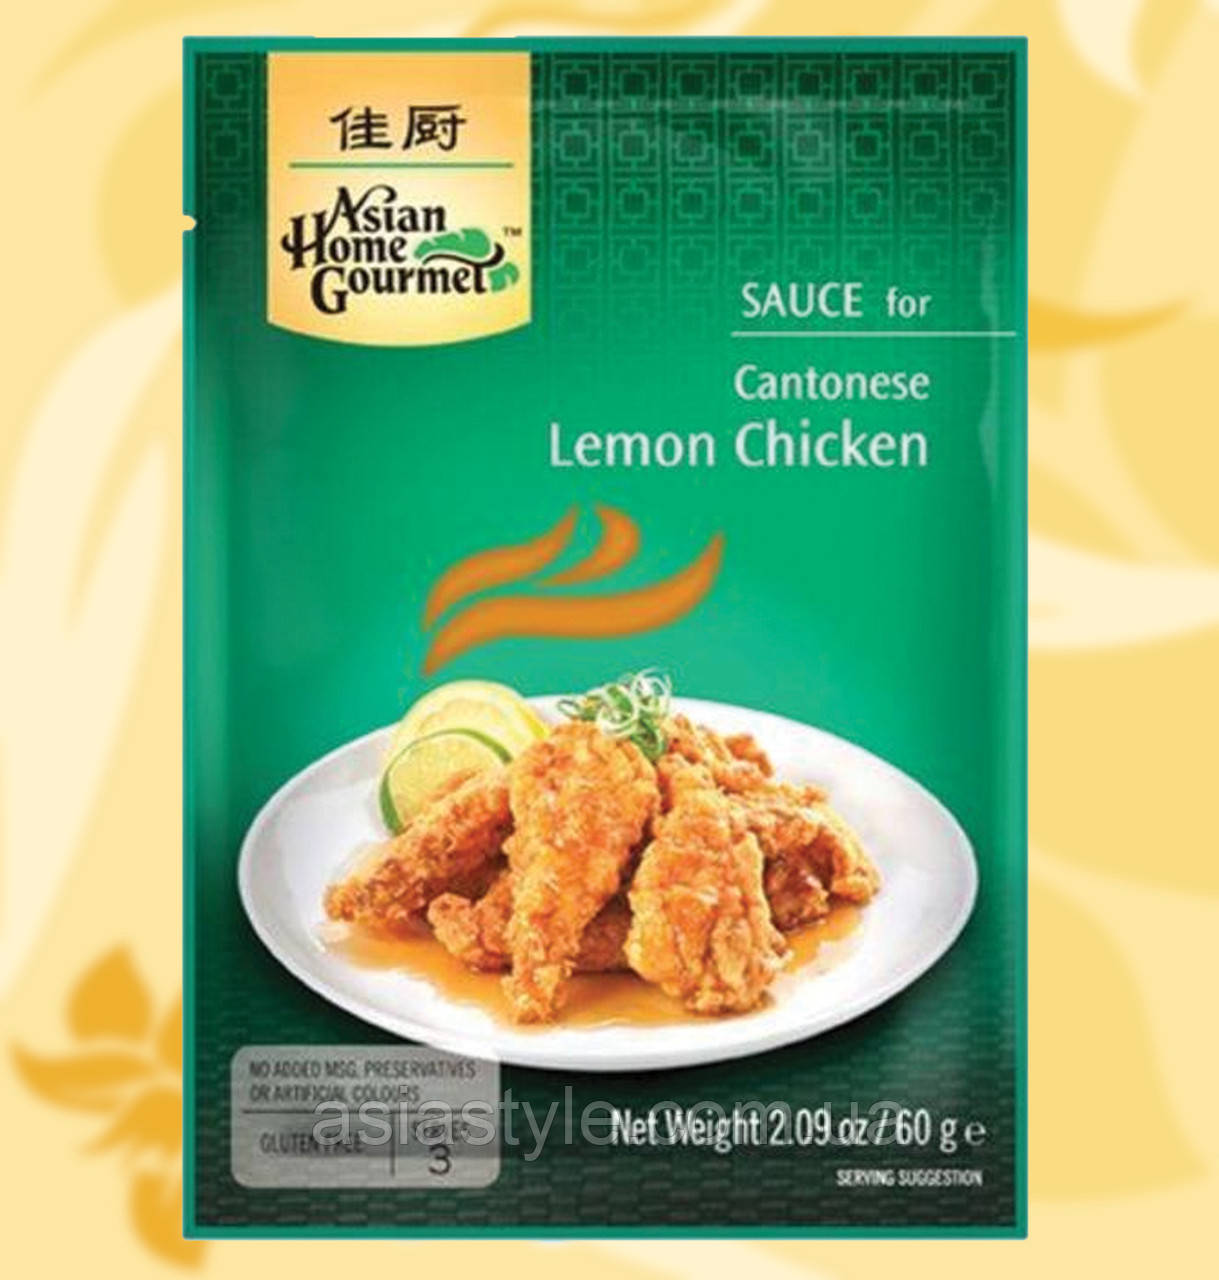 Маринад лимонний, для курки, Asian Home Gourmet, Cantonese Lemon Chicken,  50г, Дж